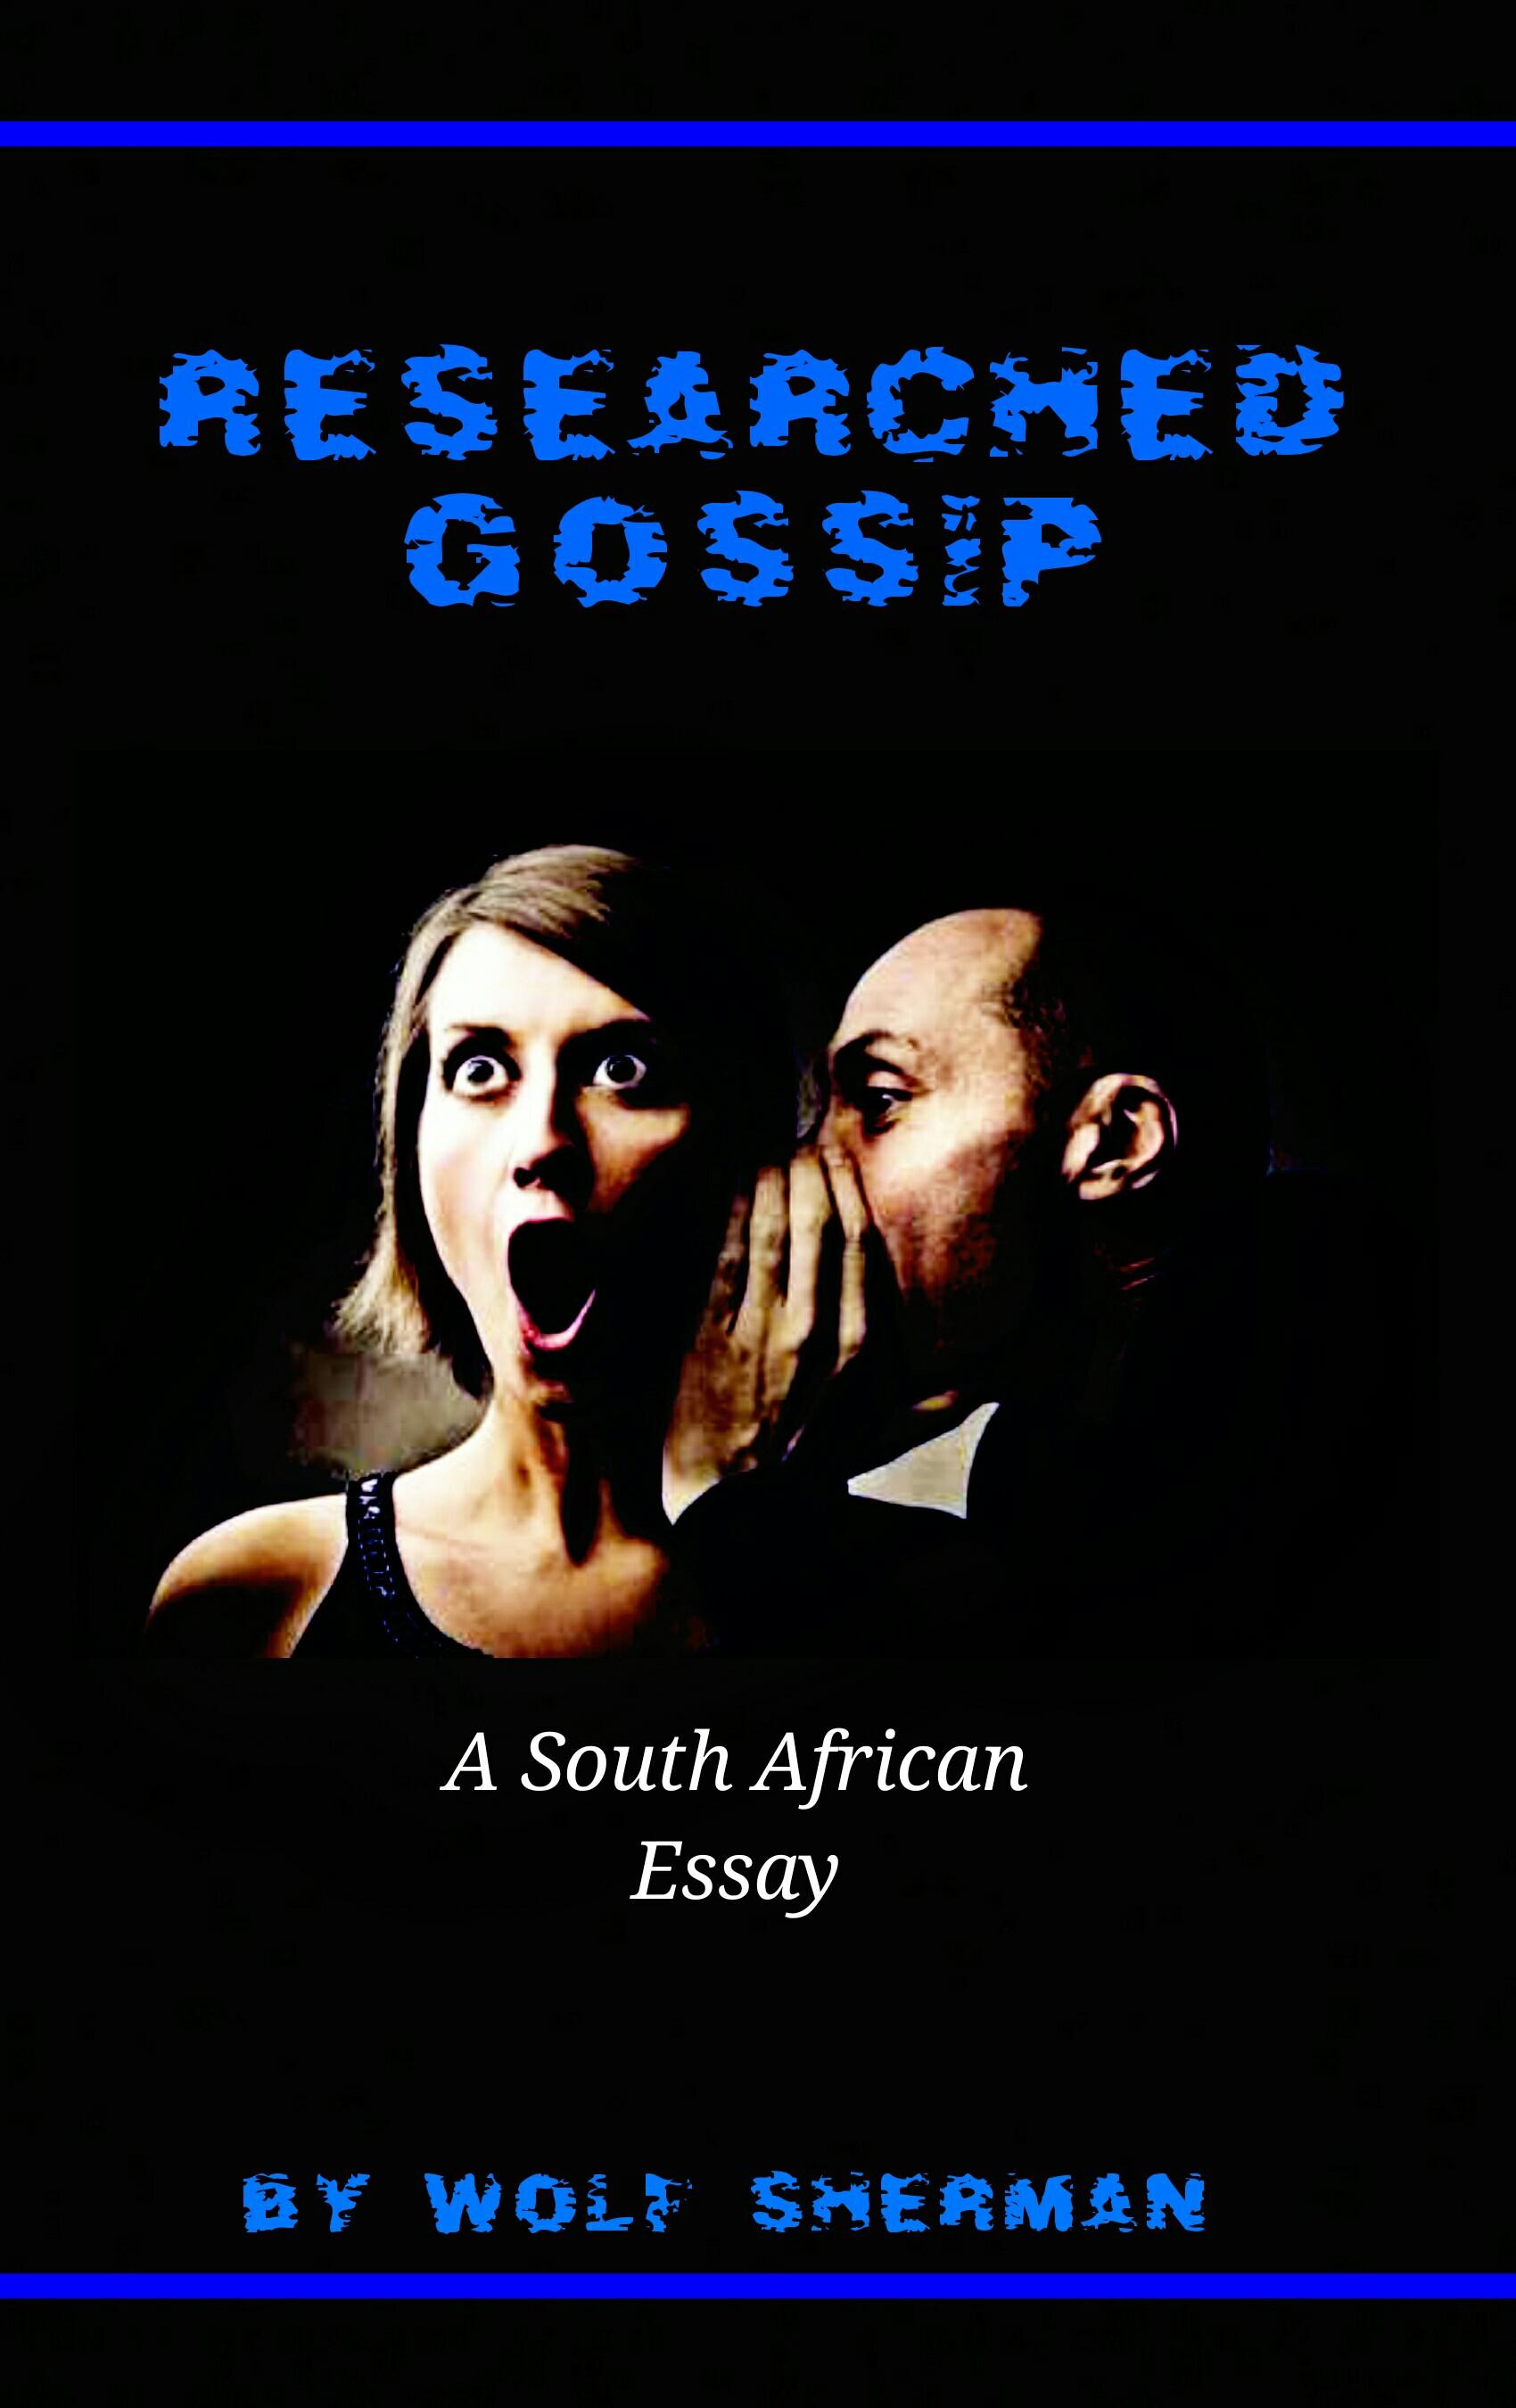 a essay on gossip